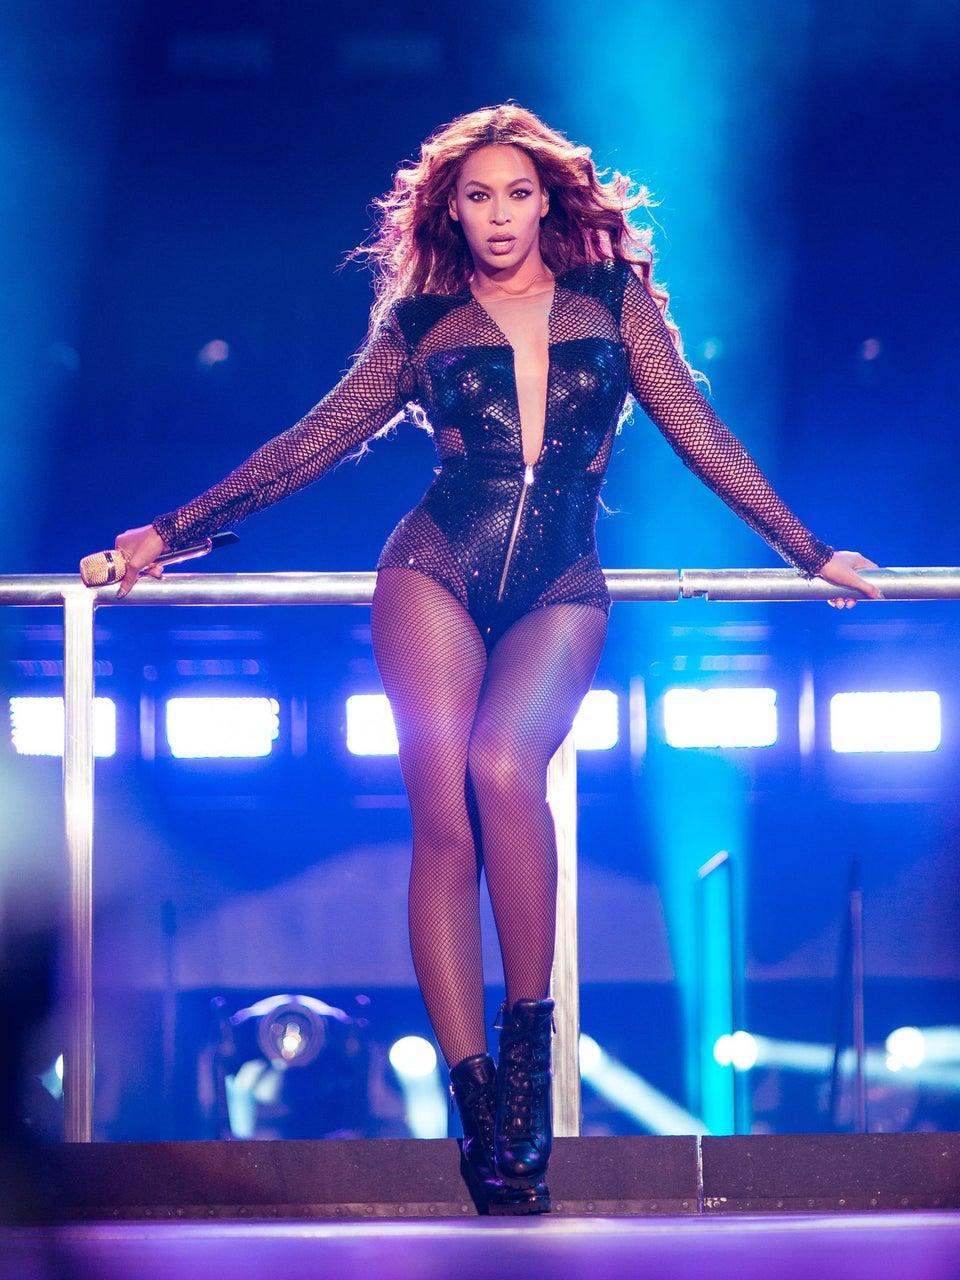 Beyonce To Perform, Receive the Vanguard Award At VMAs